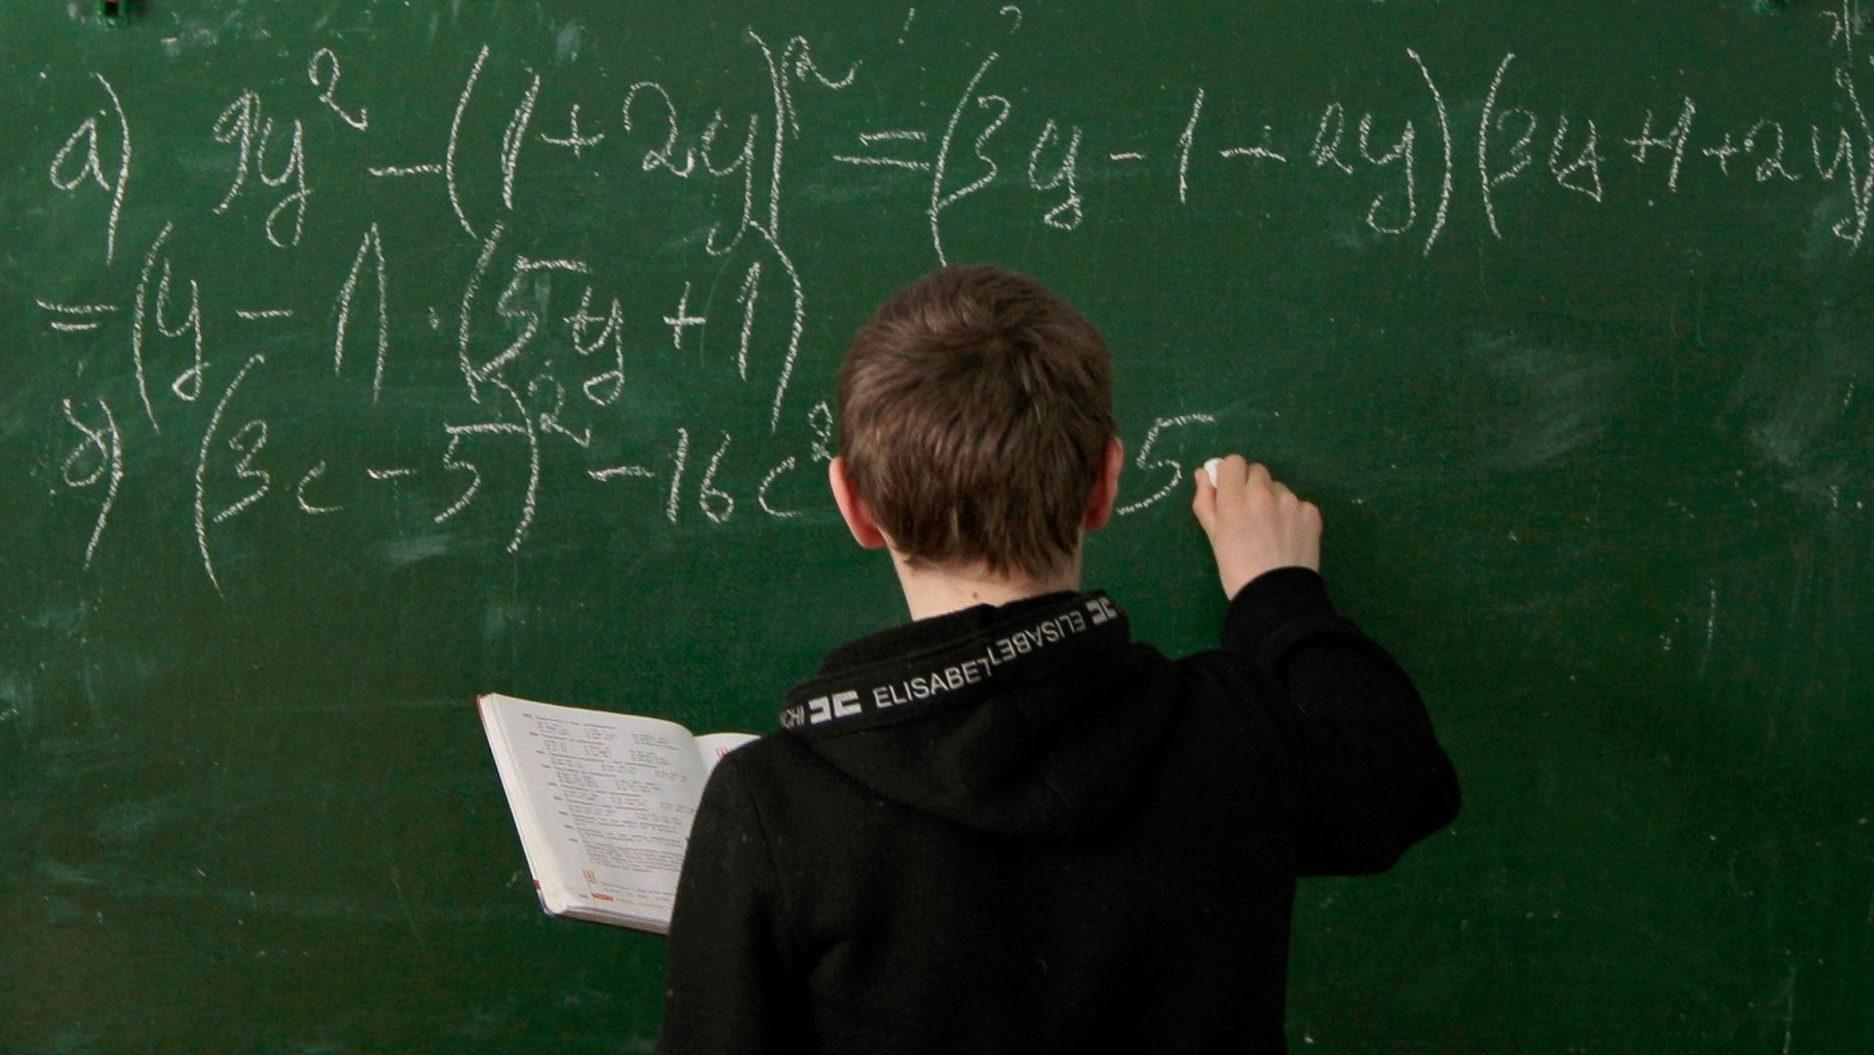 A student writes on a blackboard